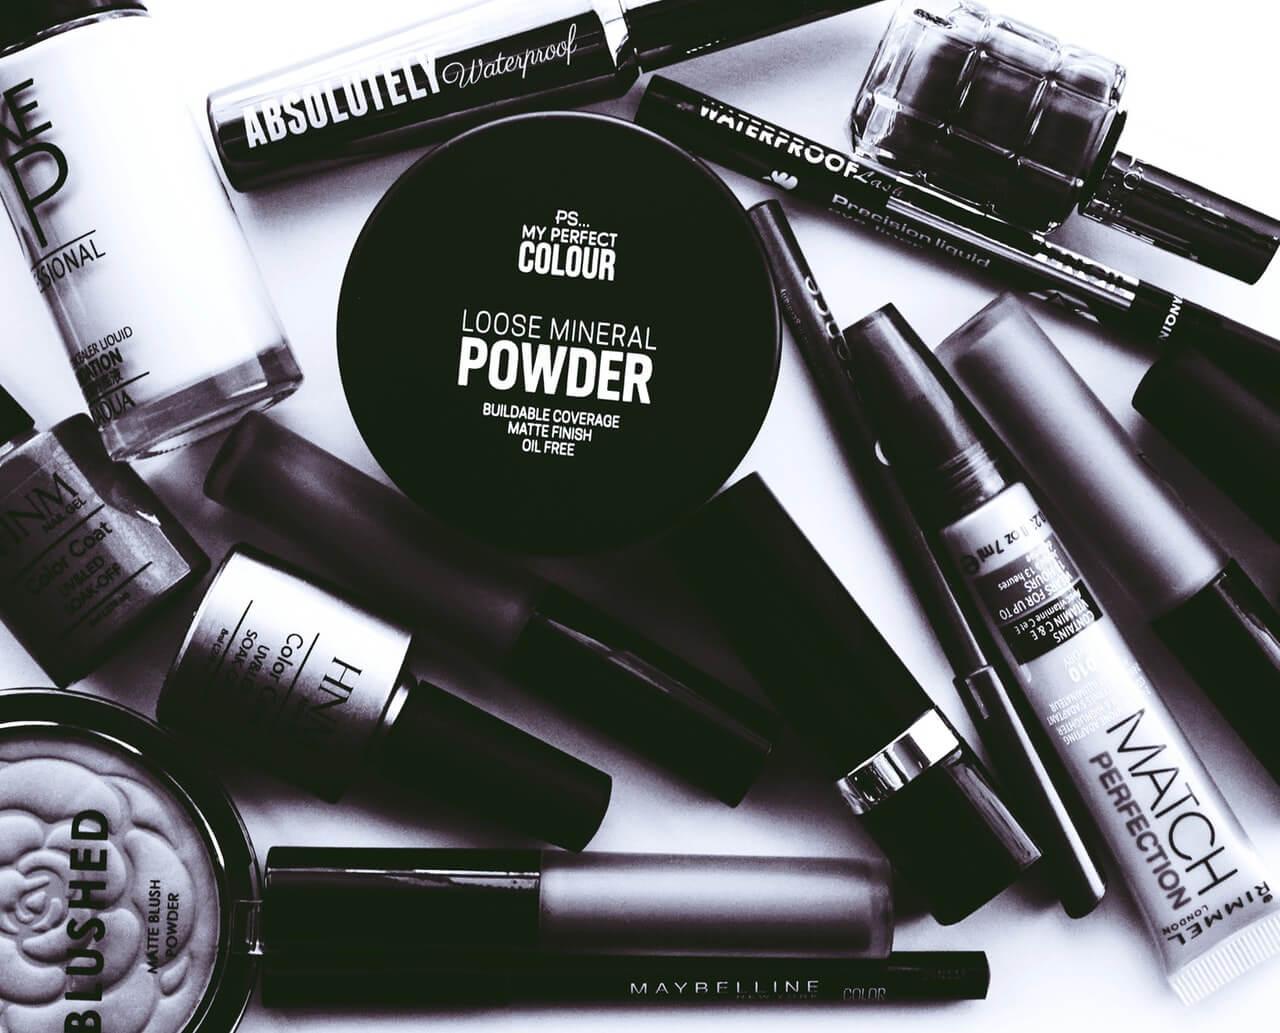 promo make up buy 1 get 1